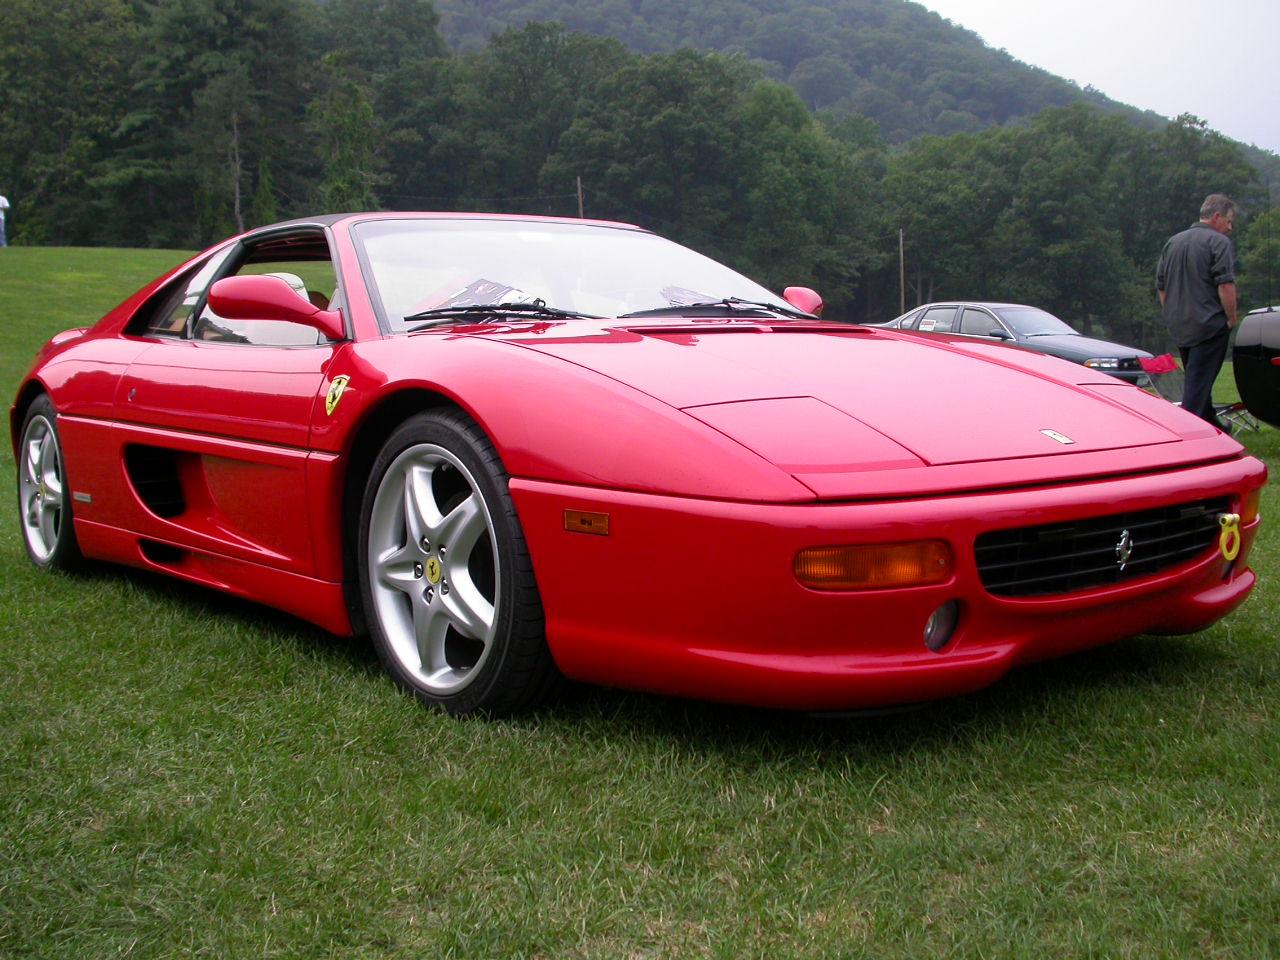 Photos Of Ferrari F 355 Gts Photo Car Ferrari F 355 Gts 03 Jpg Gr8autophoto Com